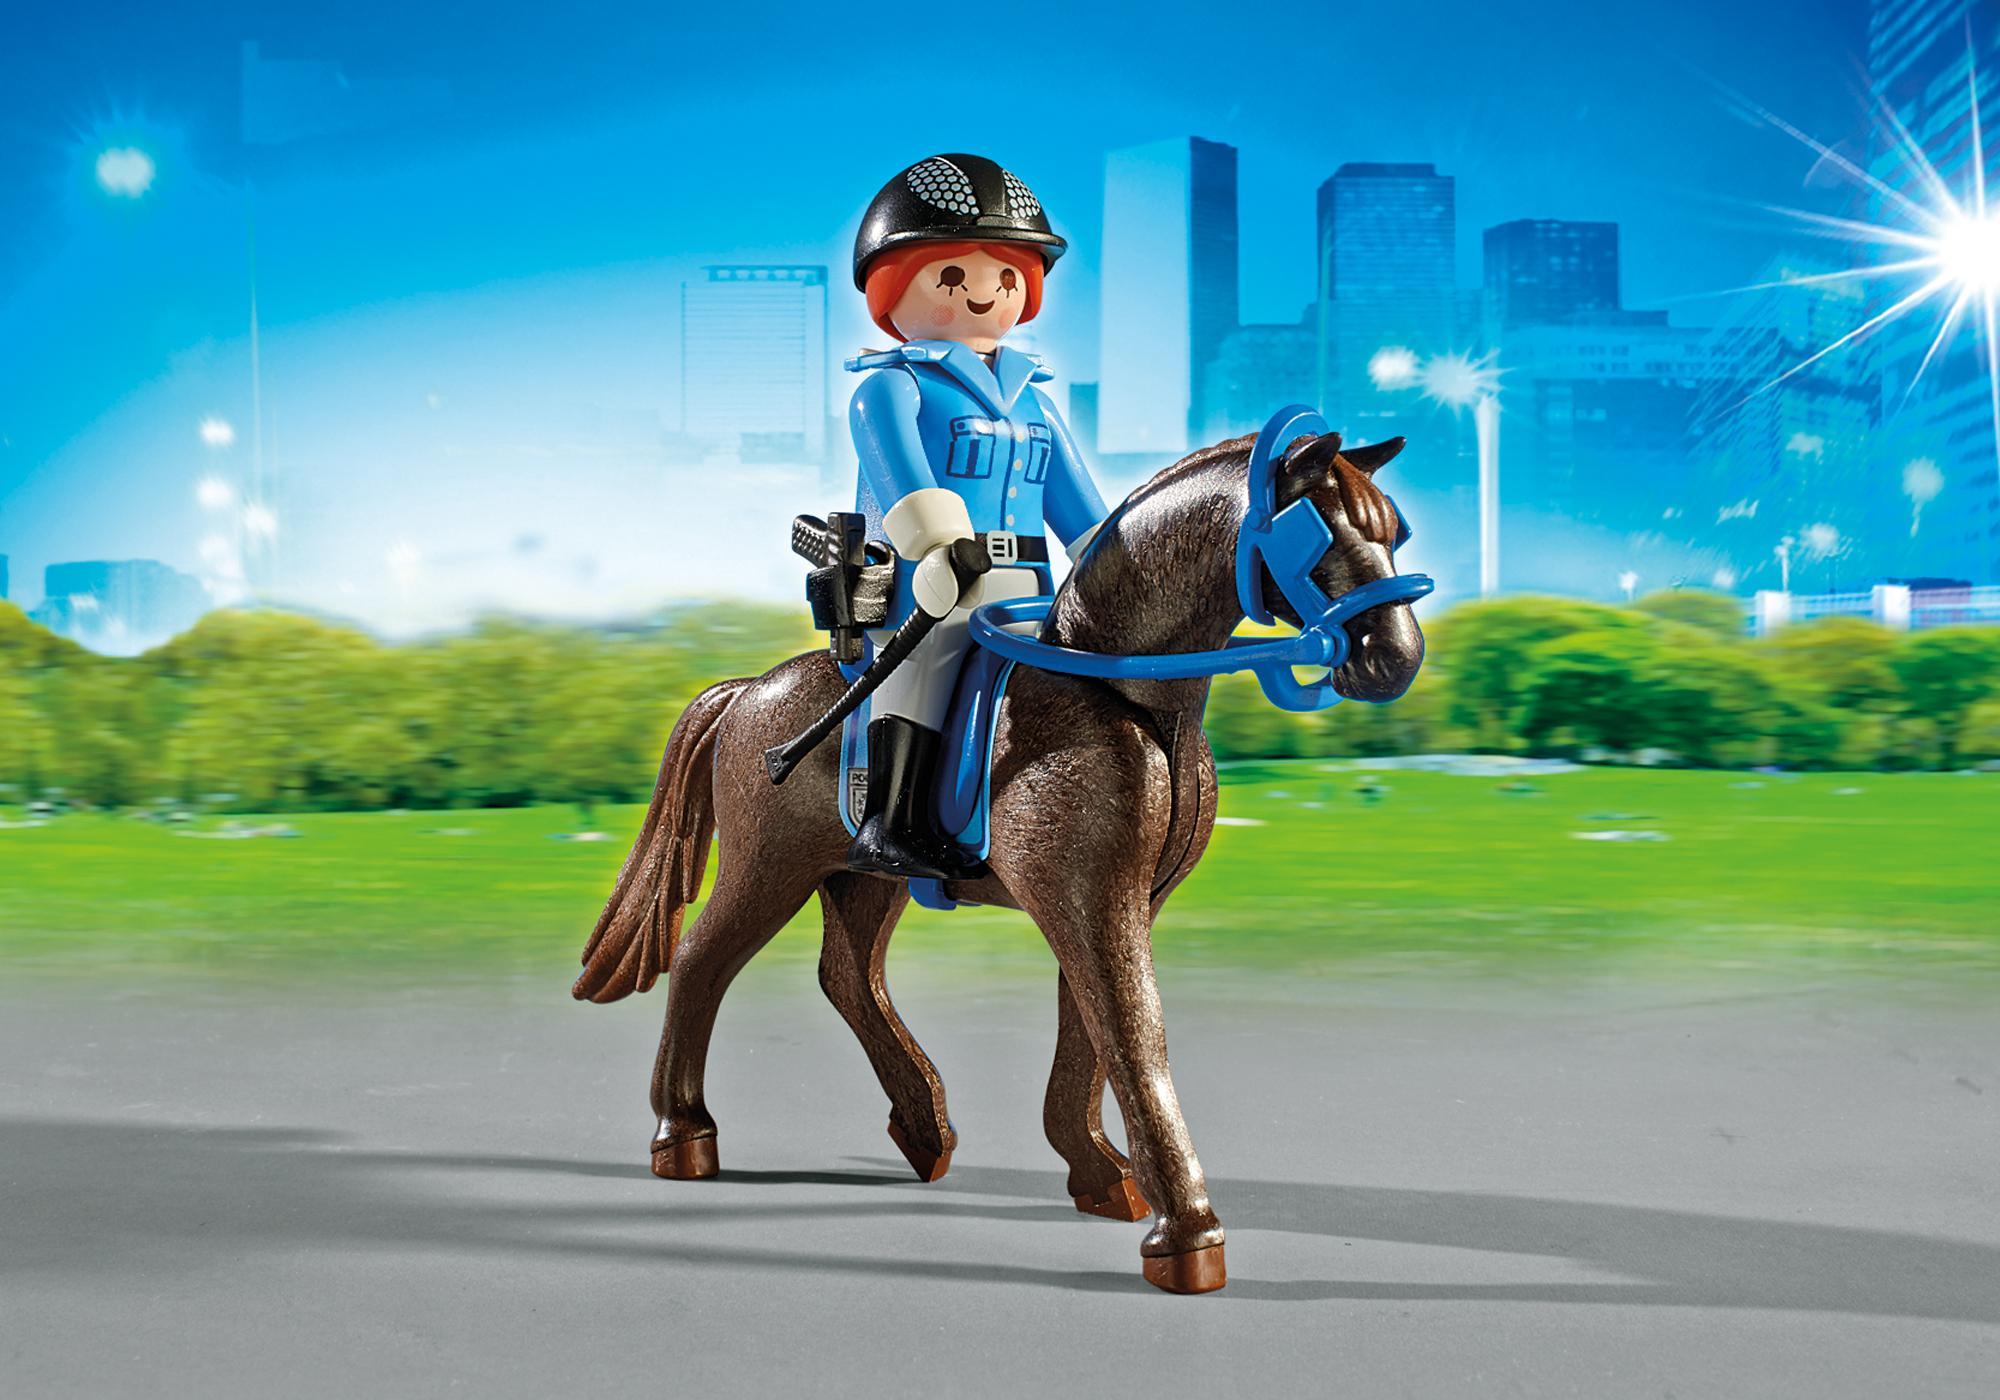 http://media.playmobil.com/i/playmobil/6875_product_extra3